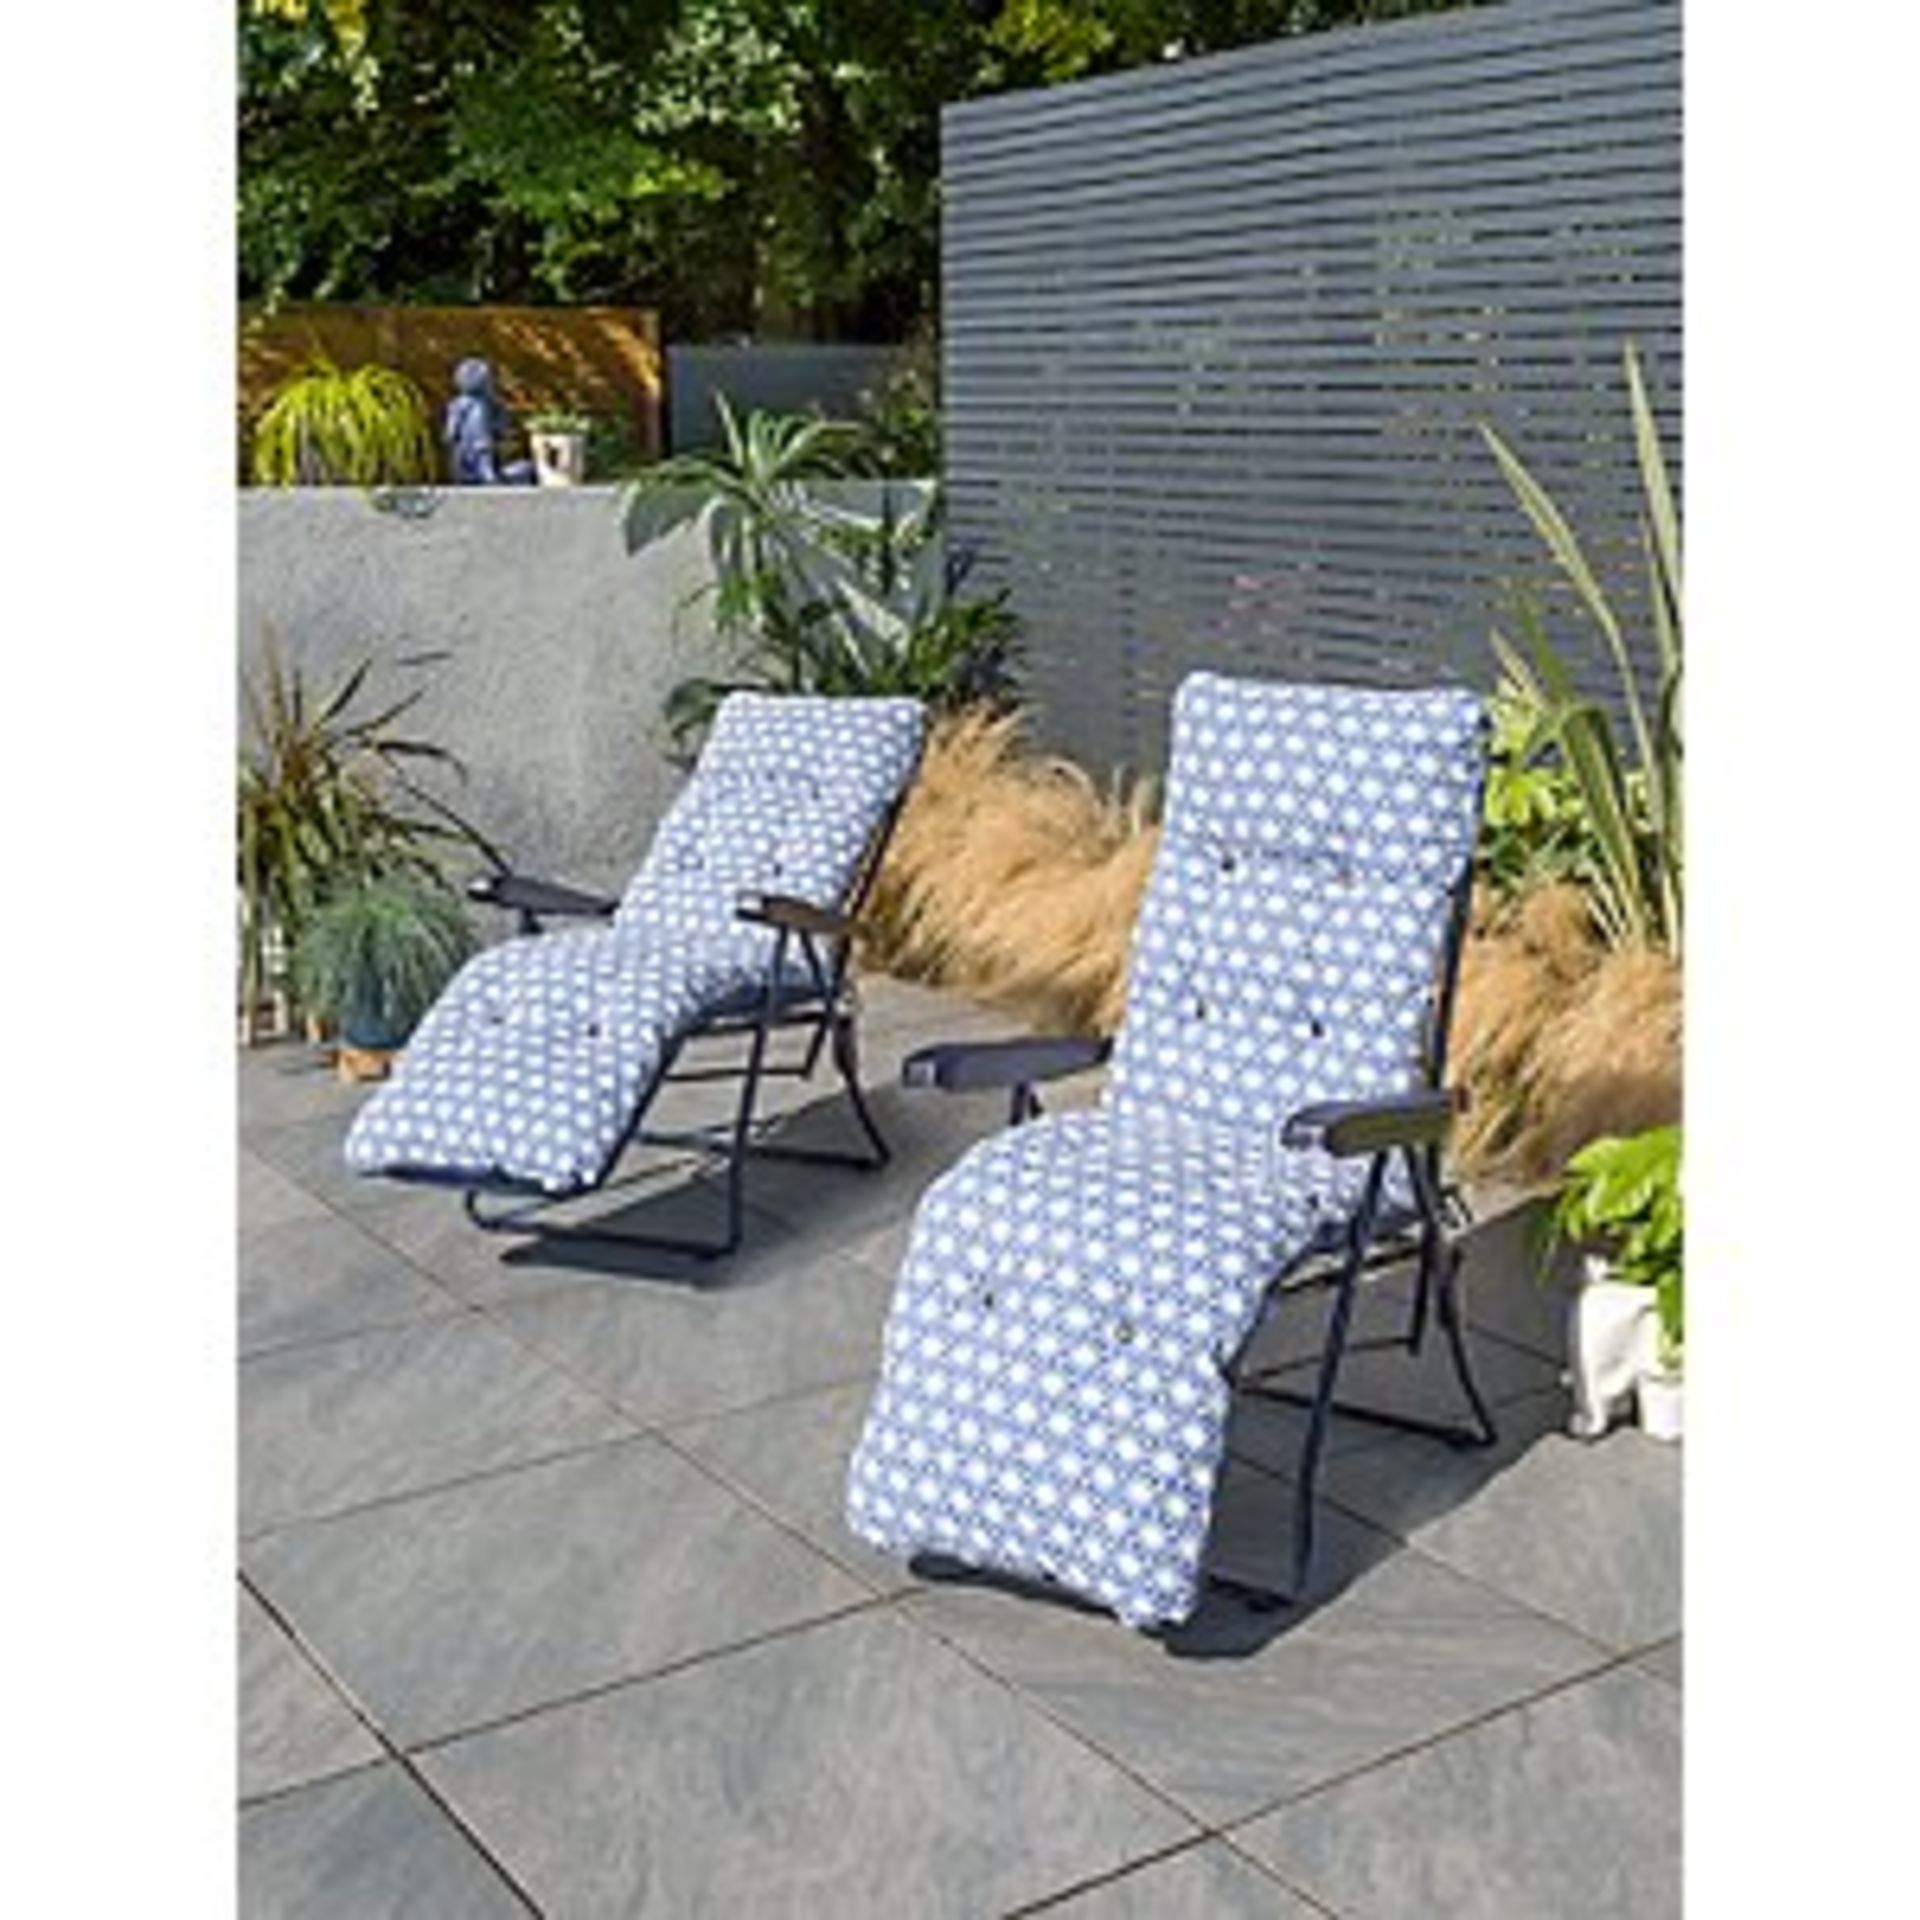 (2I) 3x Items. 2x Blue White Geometric Pattern Garden Recliners & 1x Matching Parasol. - Image 2 of 3